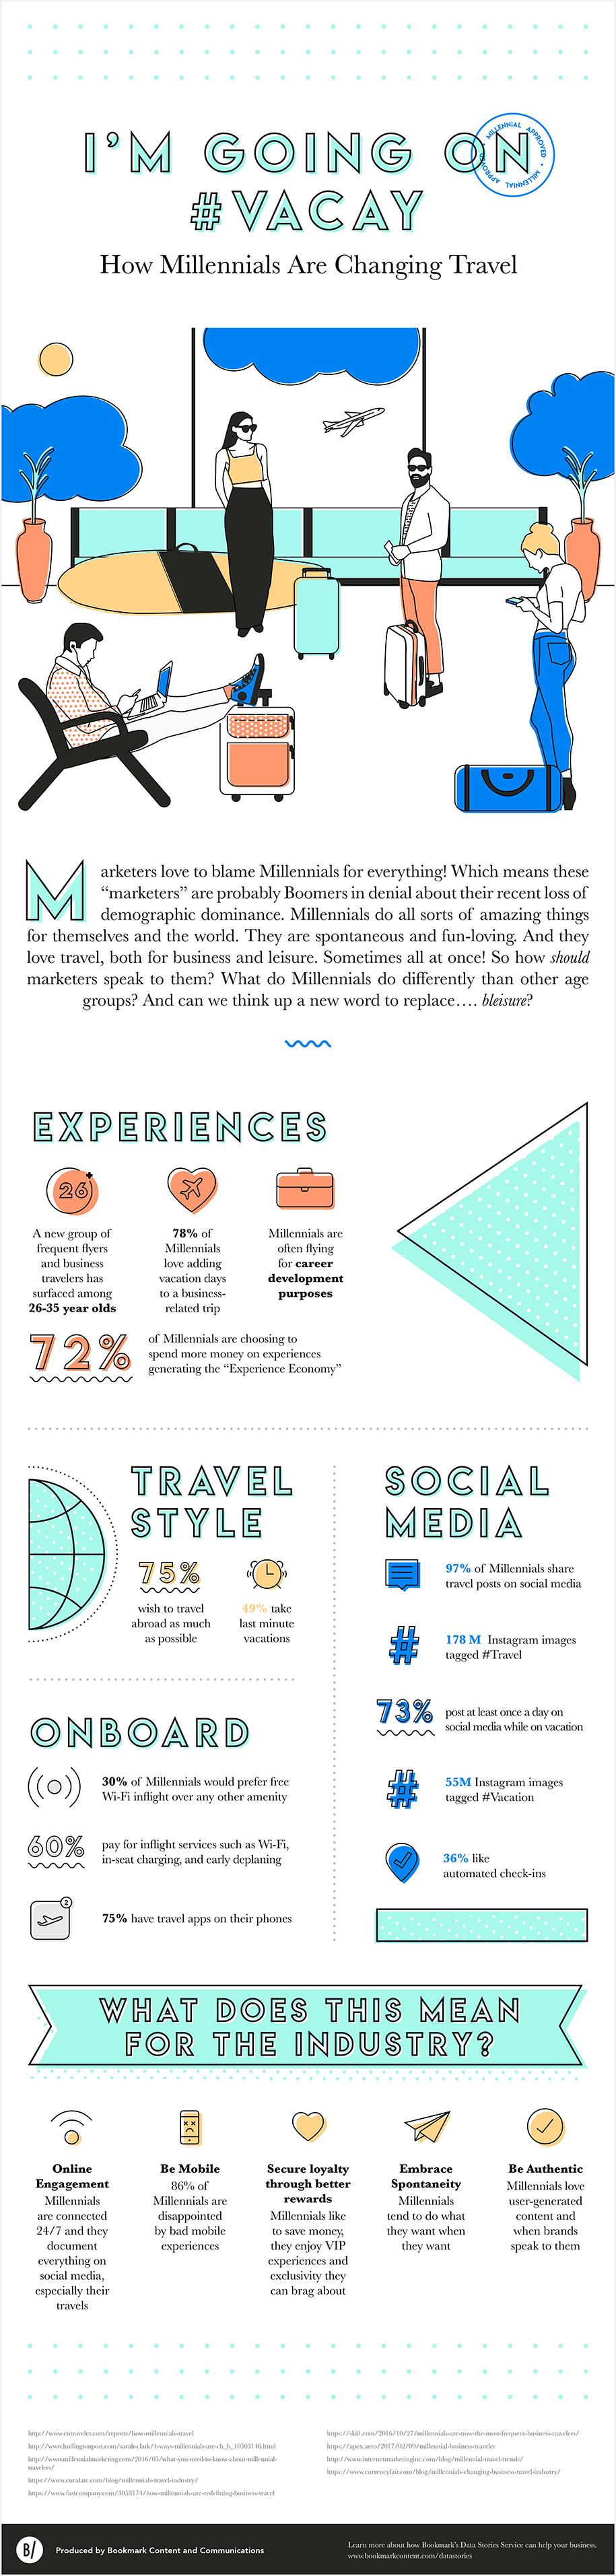 infographic millennials travel industry data stories